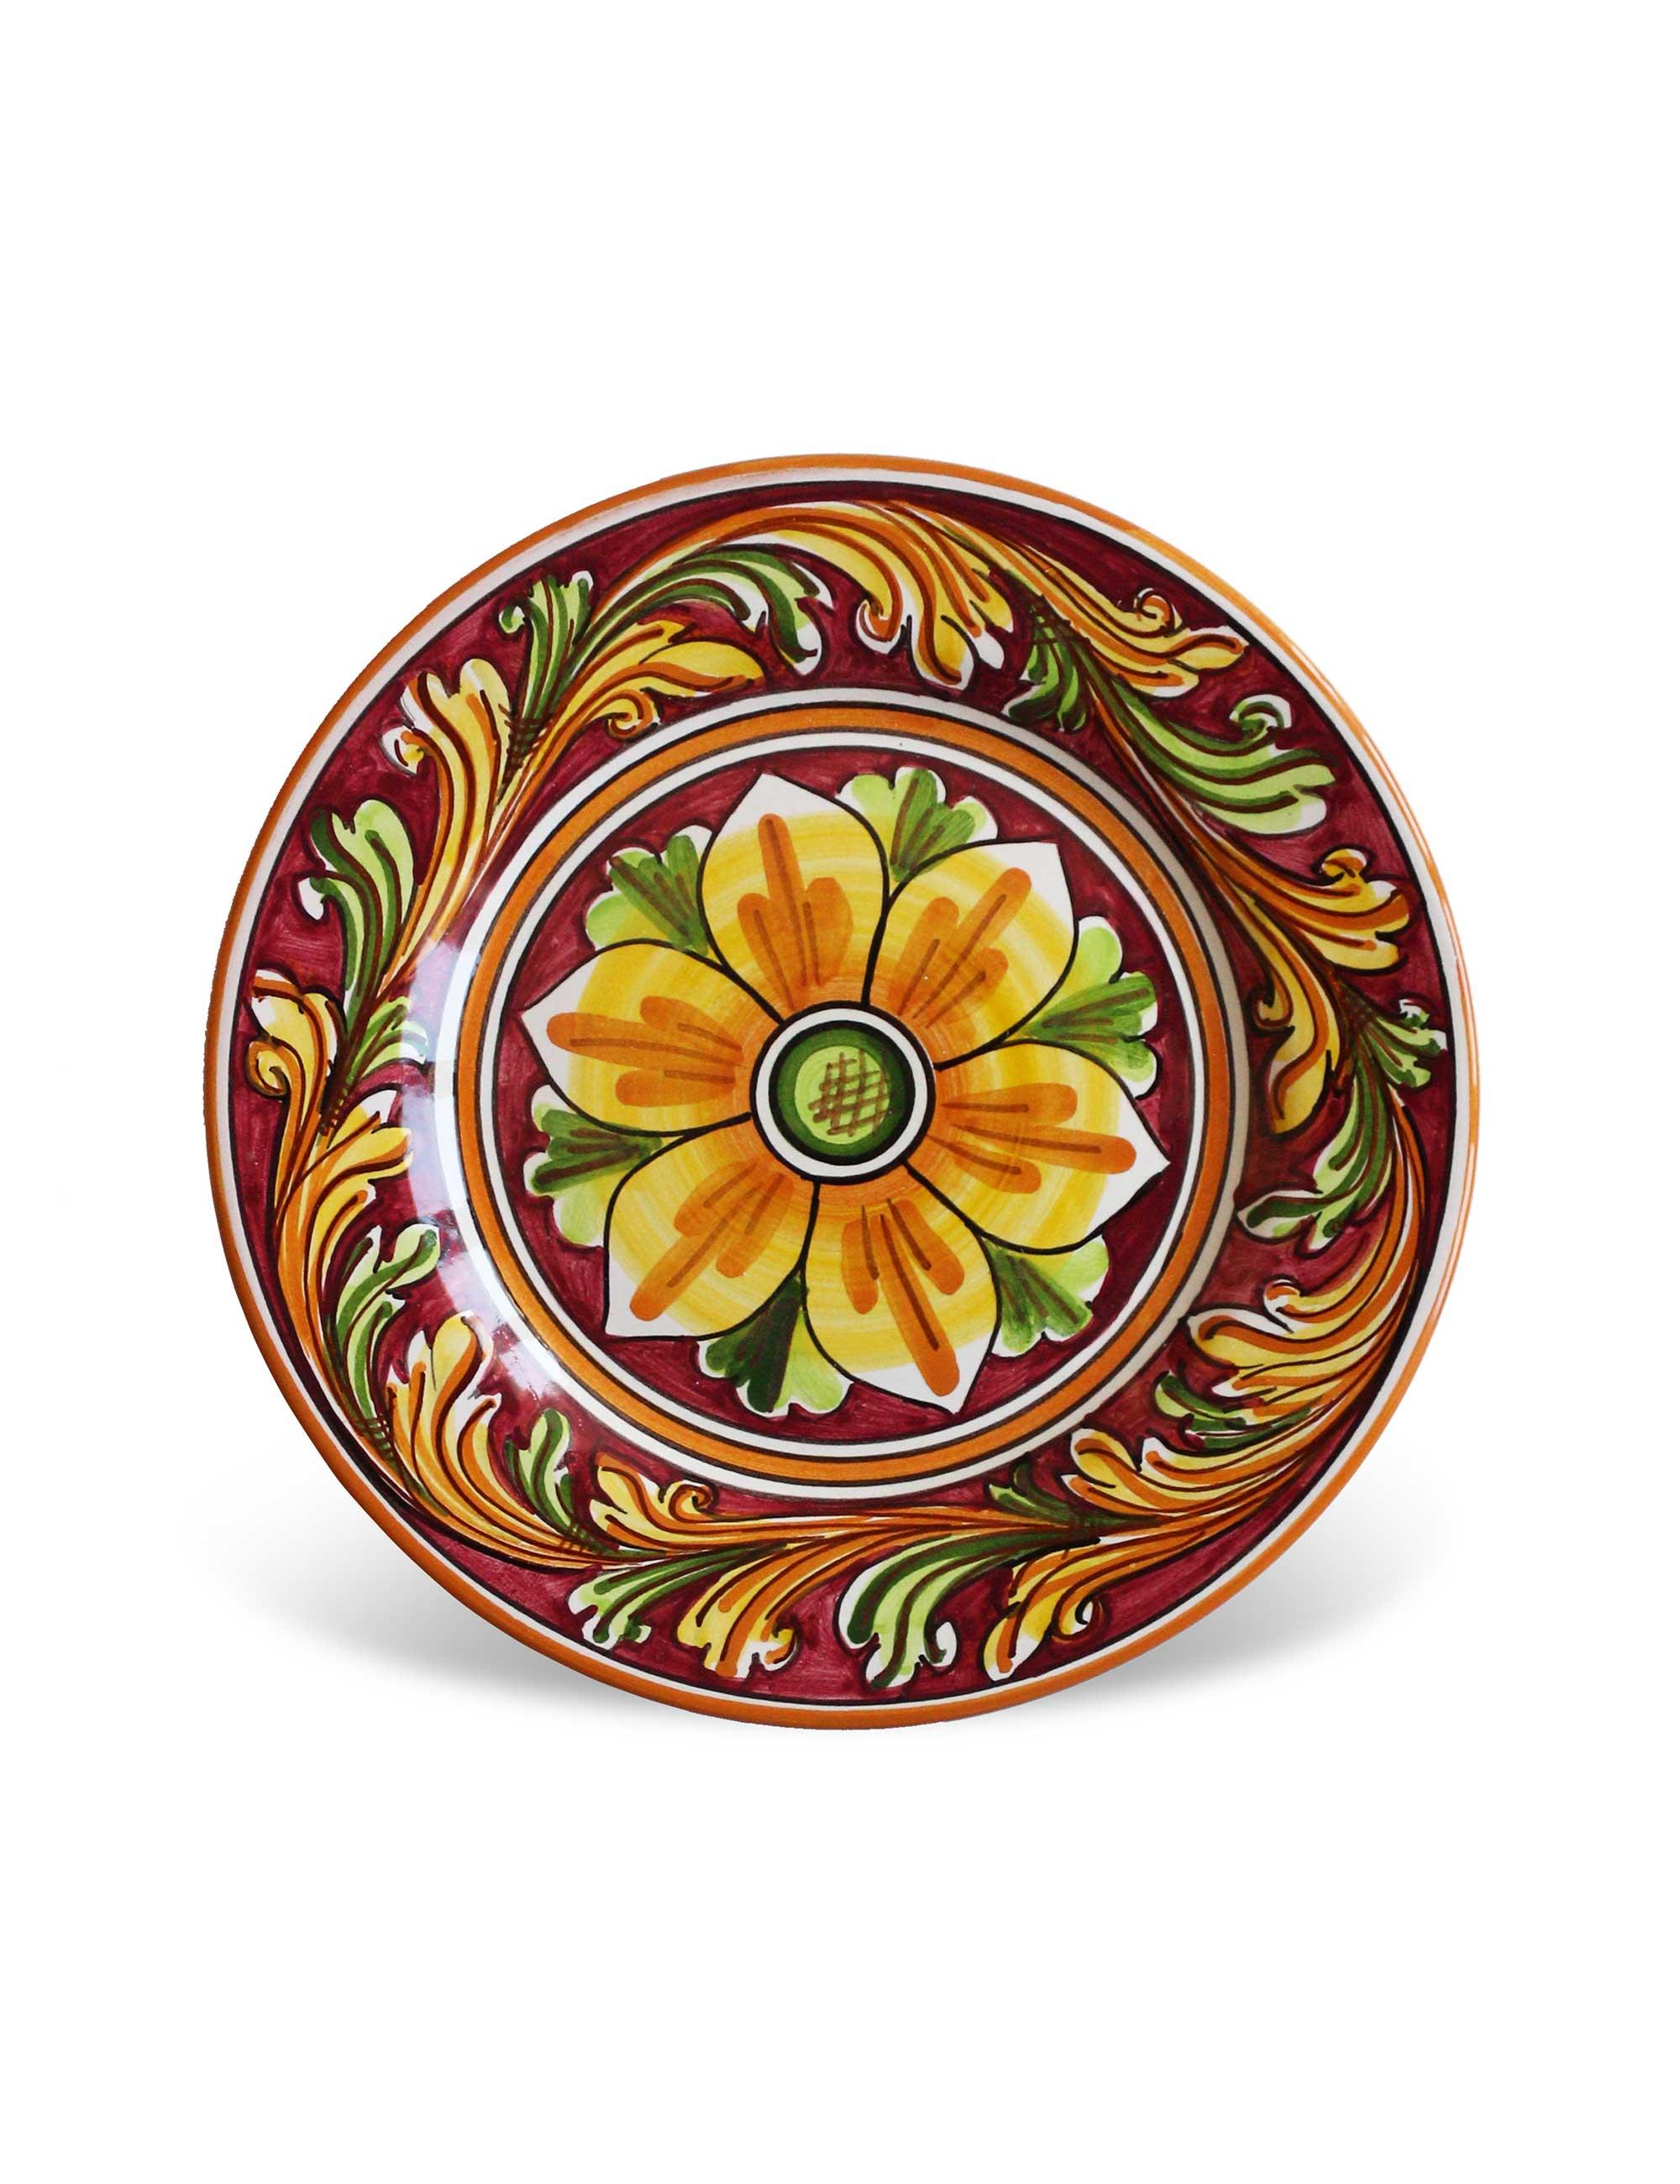 piatto dessert ceramica artigianale decorata Giarratana